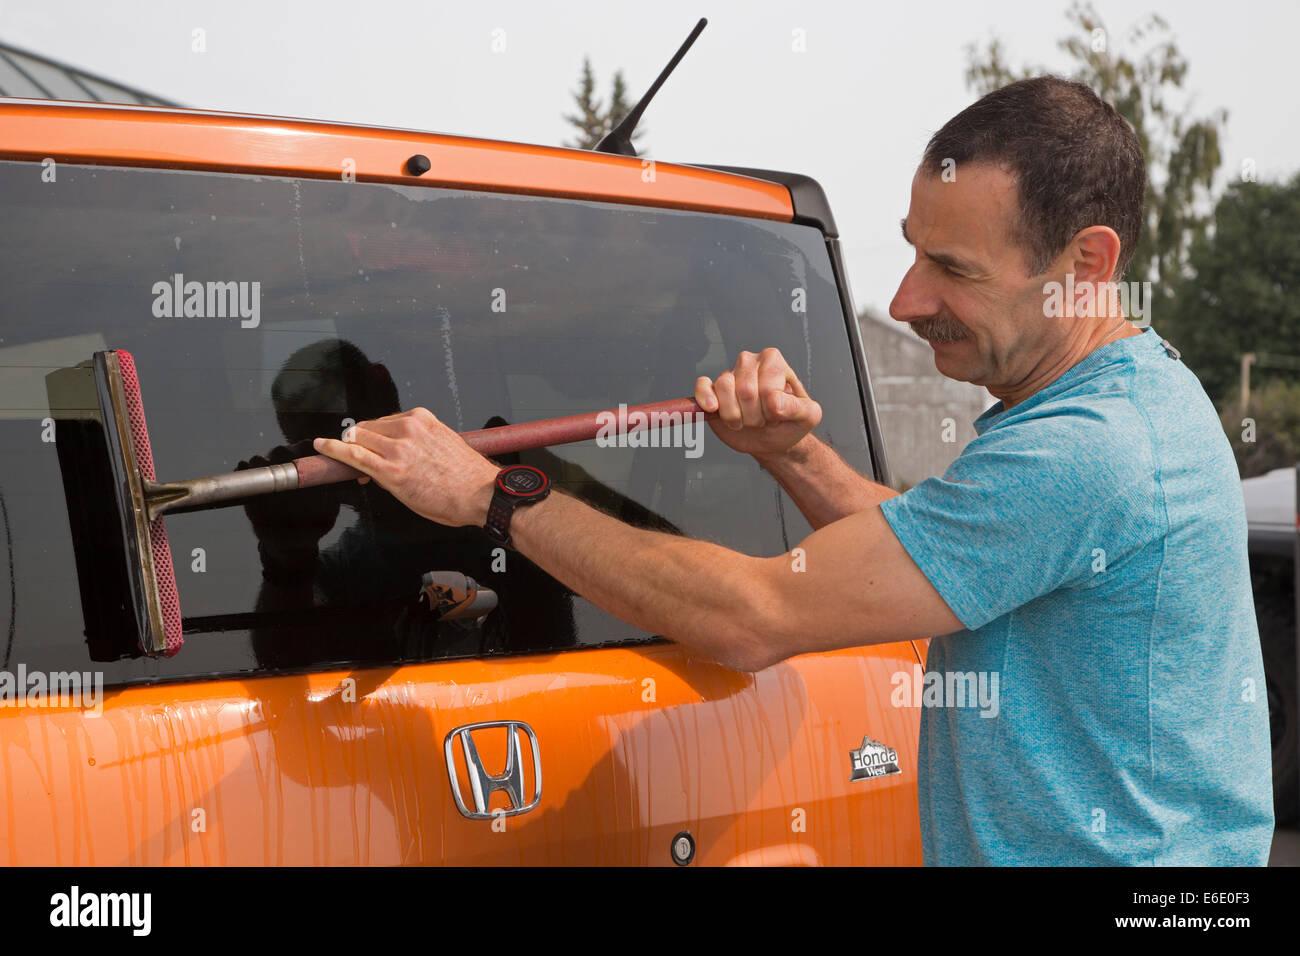 Man washing vehicle windshield at service station - Stock Image